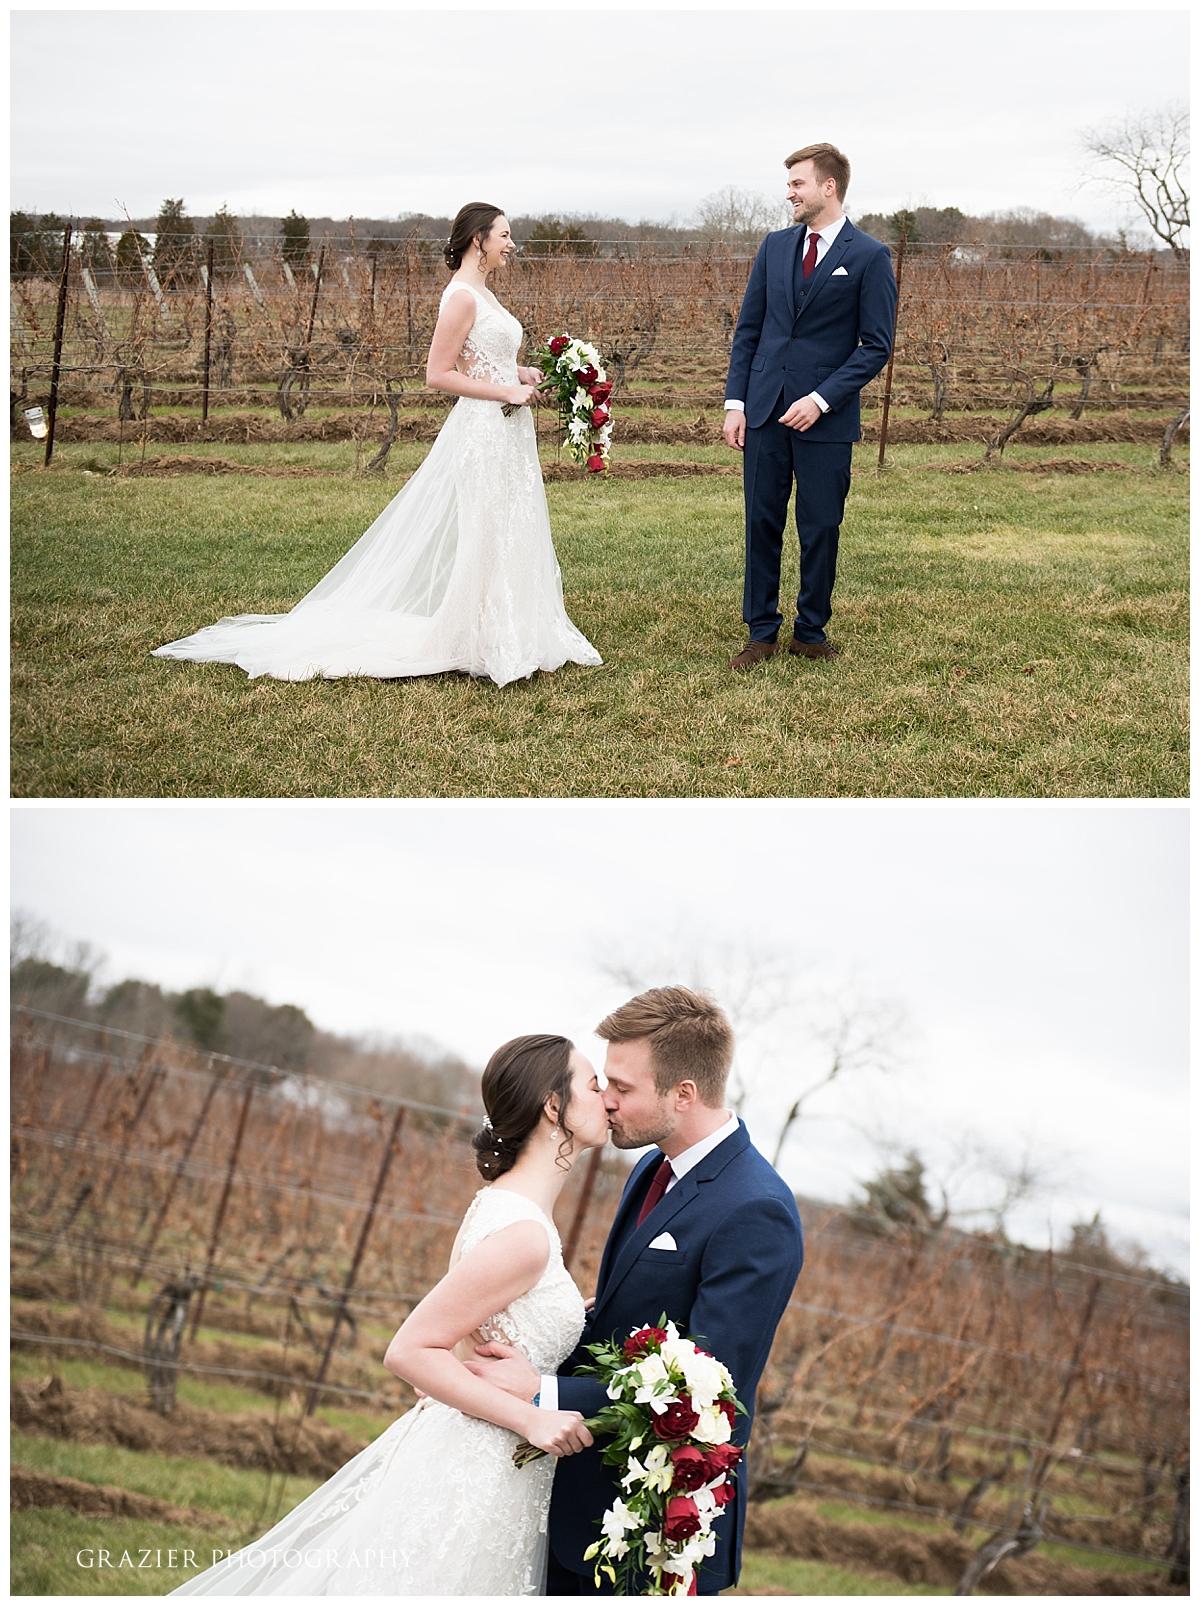 Saltwater Farm Vineyard Wedding Grazier Photography 1222-17-20_WEB.jpg